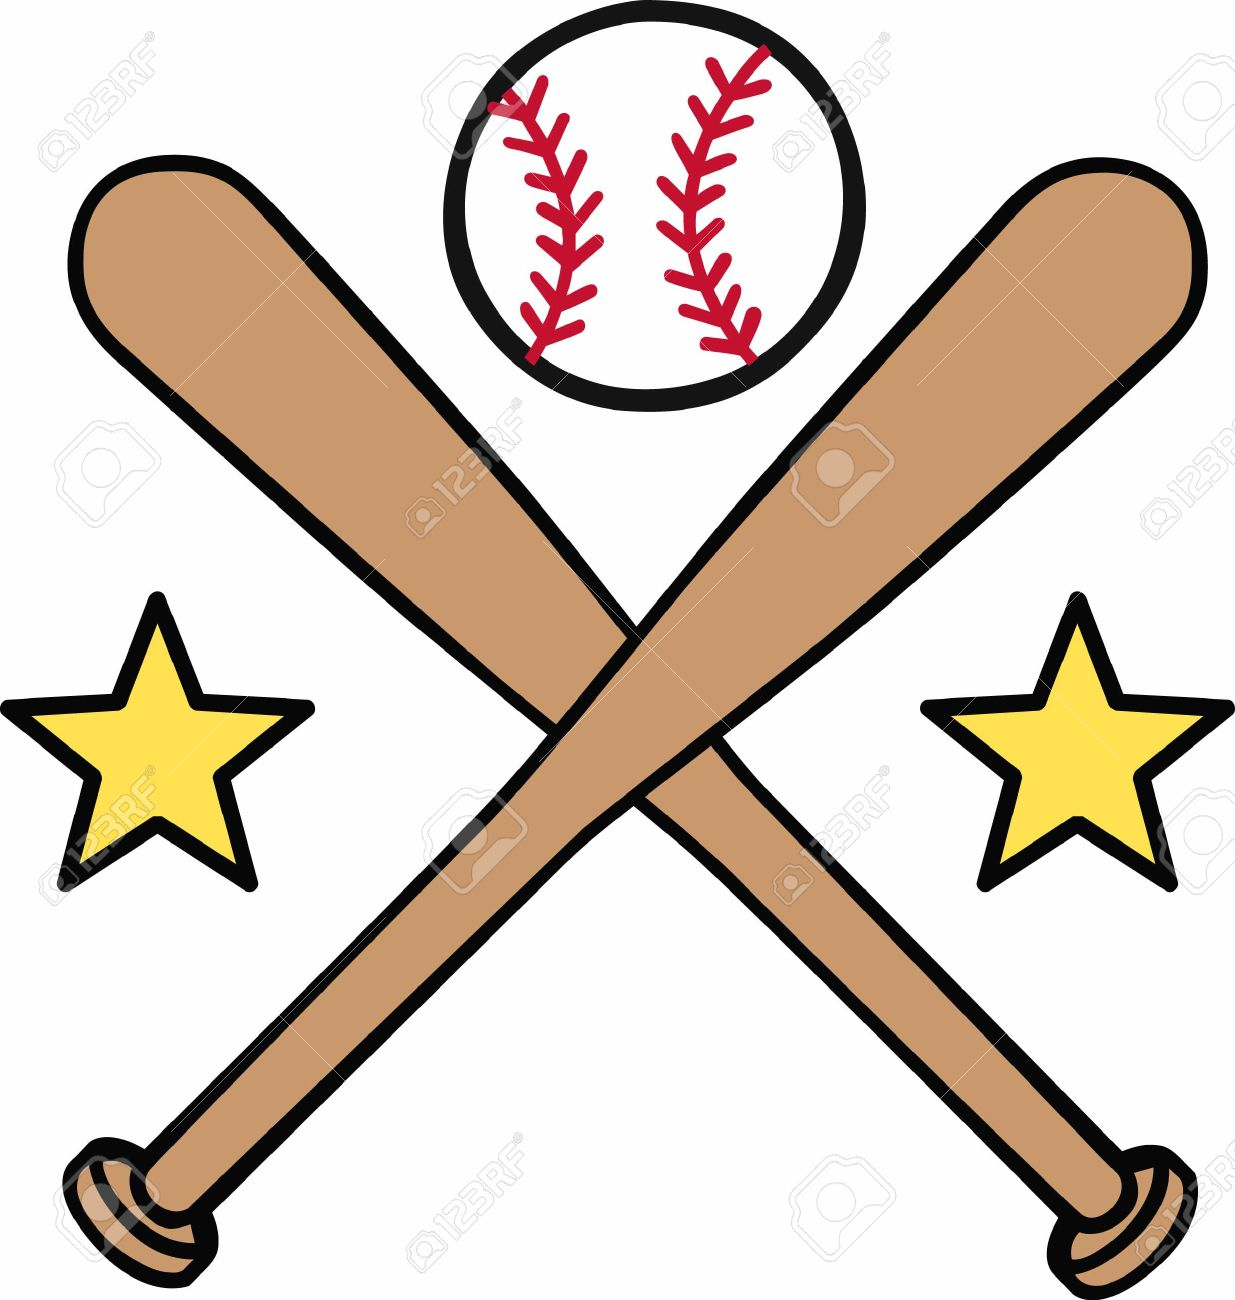 Baseball chain banner clipart free svg freeuse download Baseball Bat Crossed | Free download best Baseball Bat Crossed on ... svg freeuse download